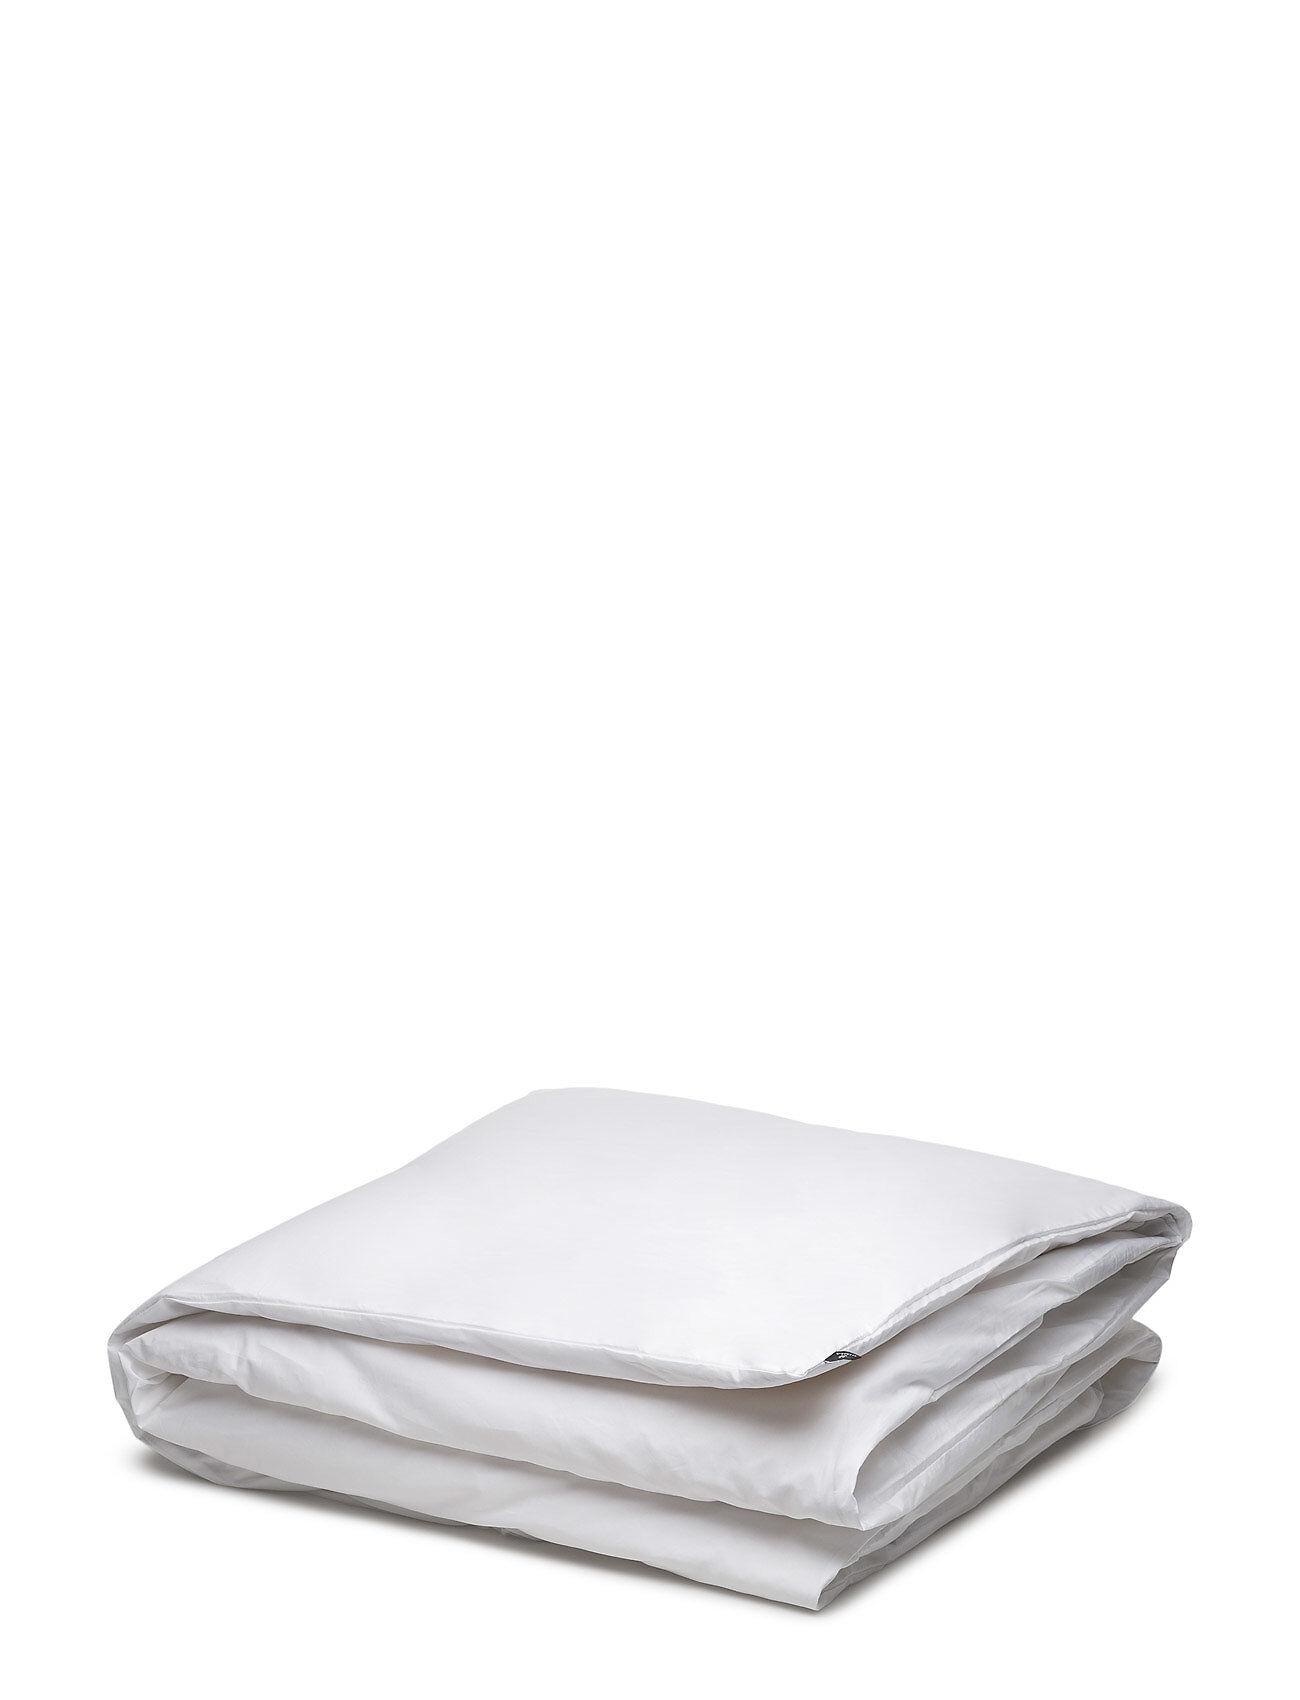 Himla Drottningholm Duvet Cover Home Bedroom Bedding Duvetcovers Valkoinen Himla